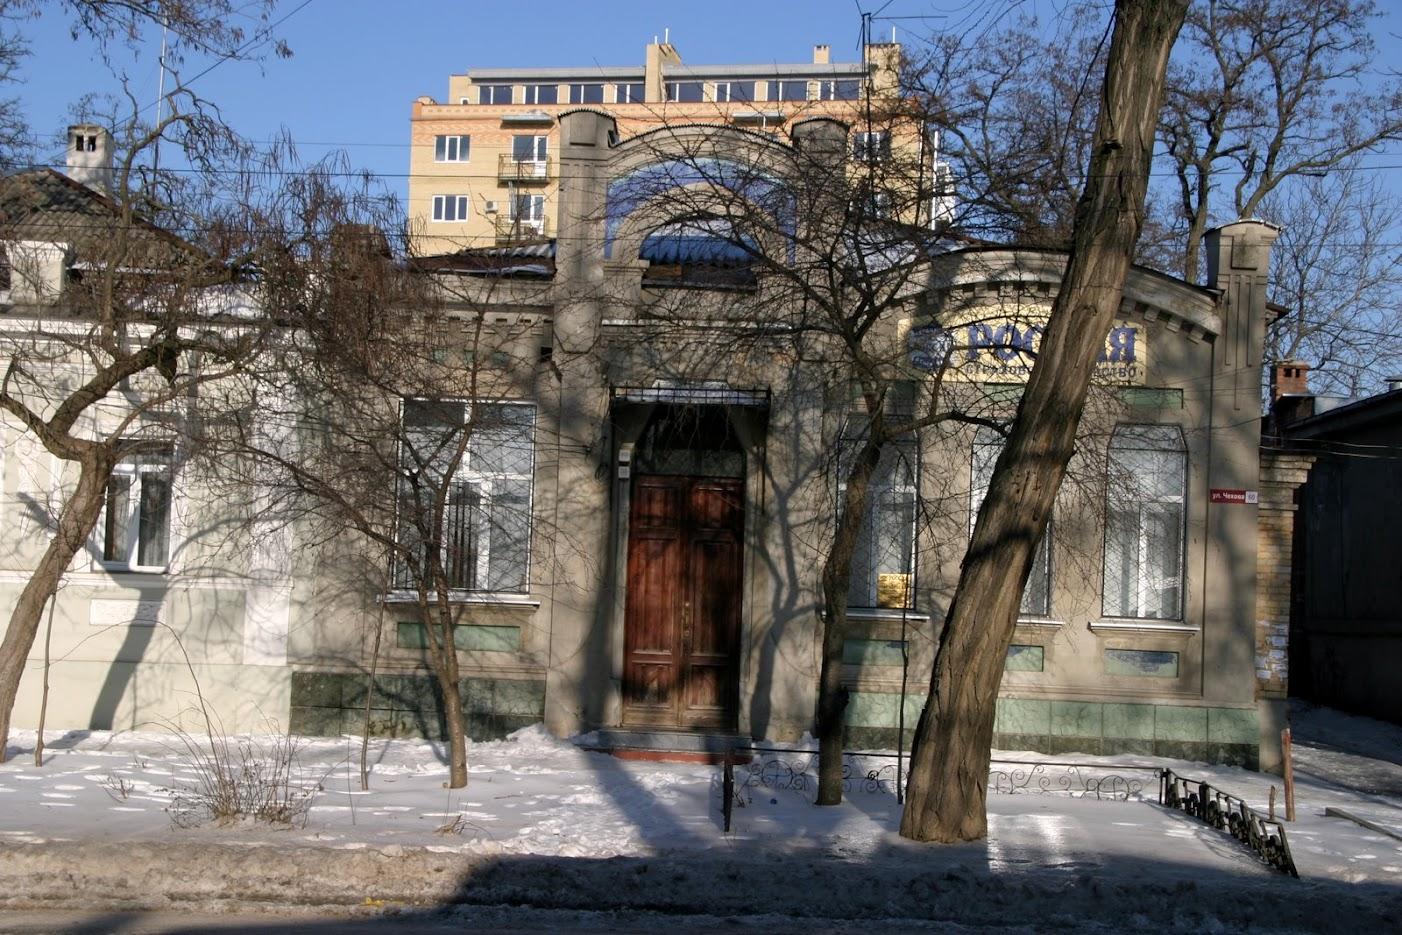 https://sites.google.com/site/istoriceskijtaganrog/cehova-ulica/dom-60